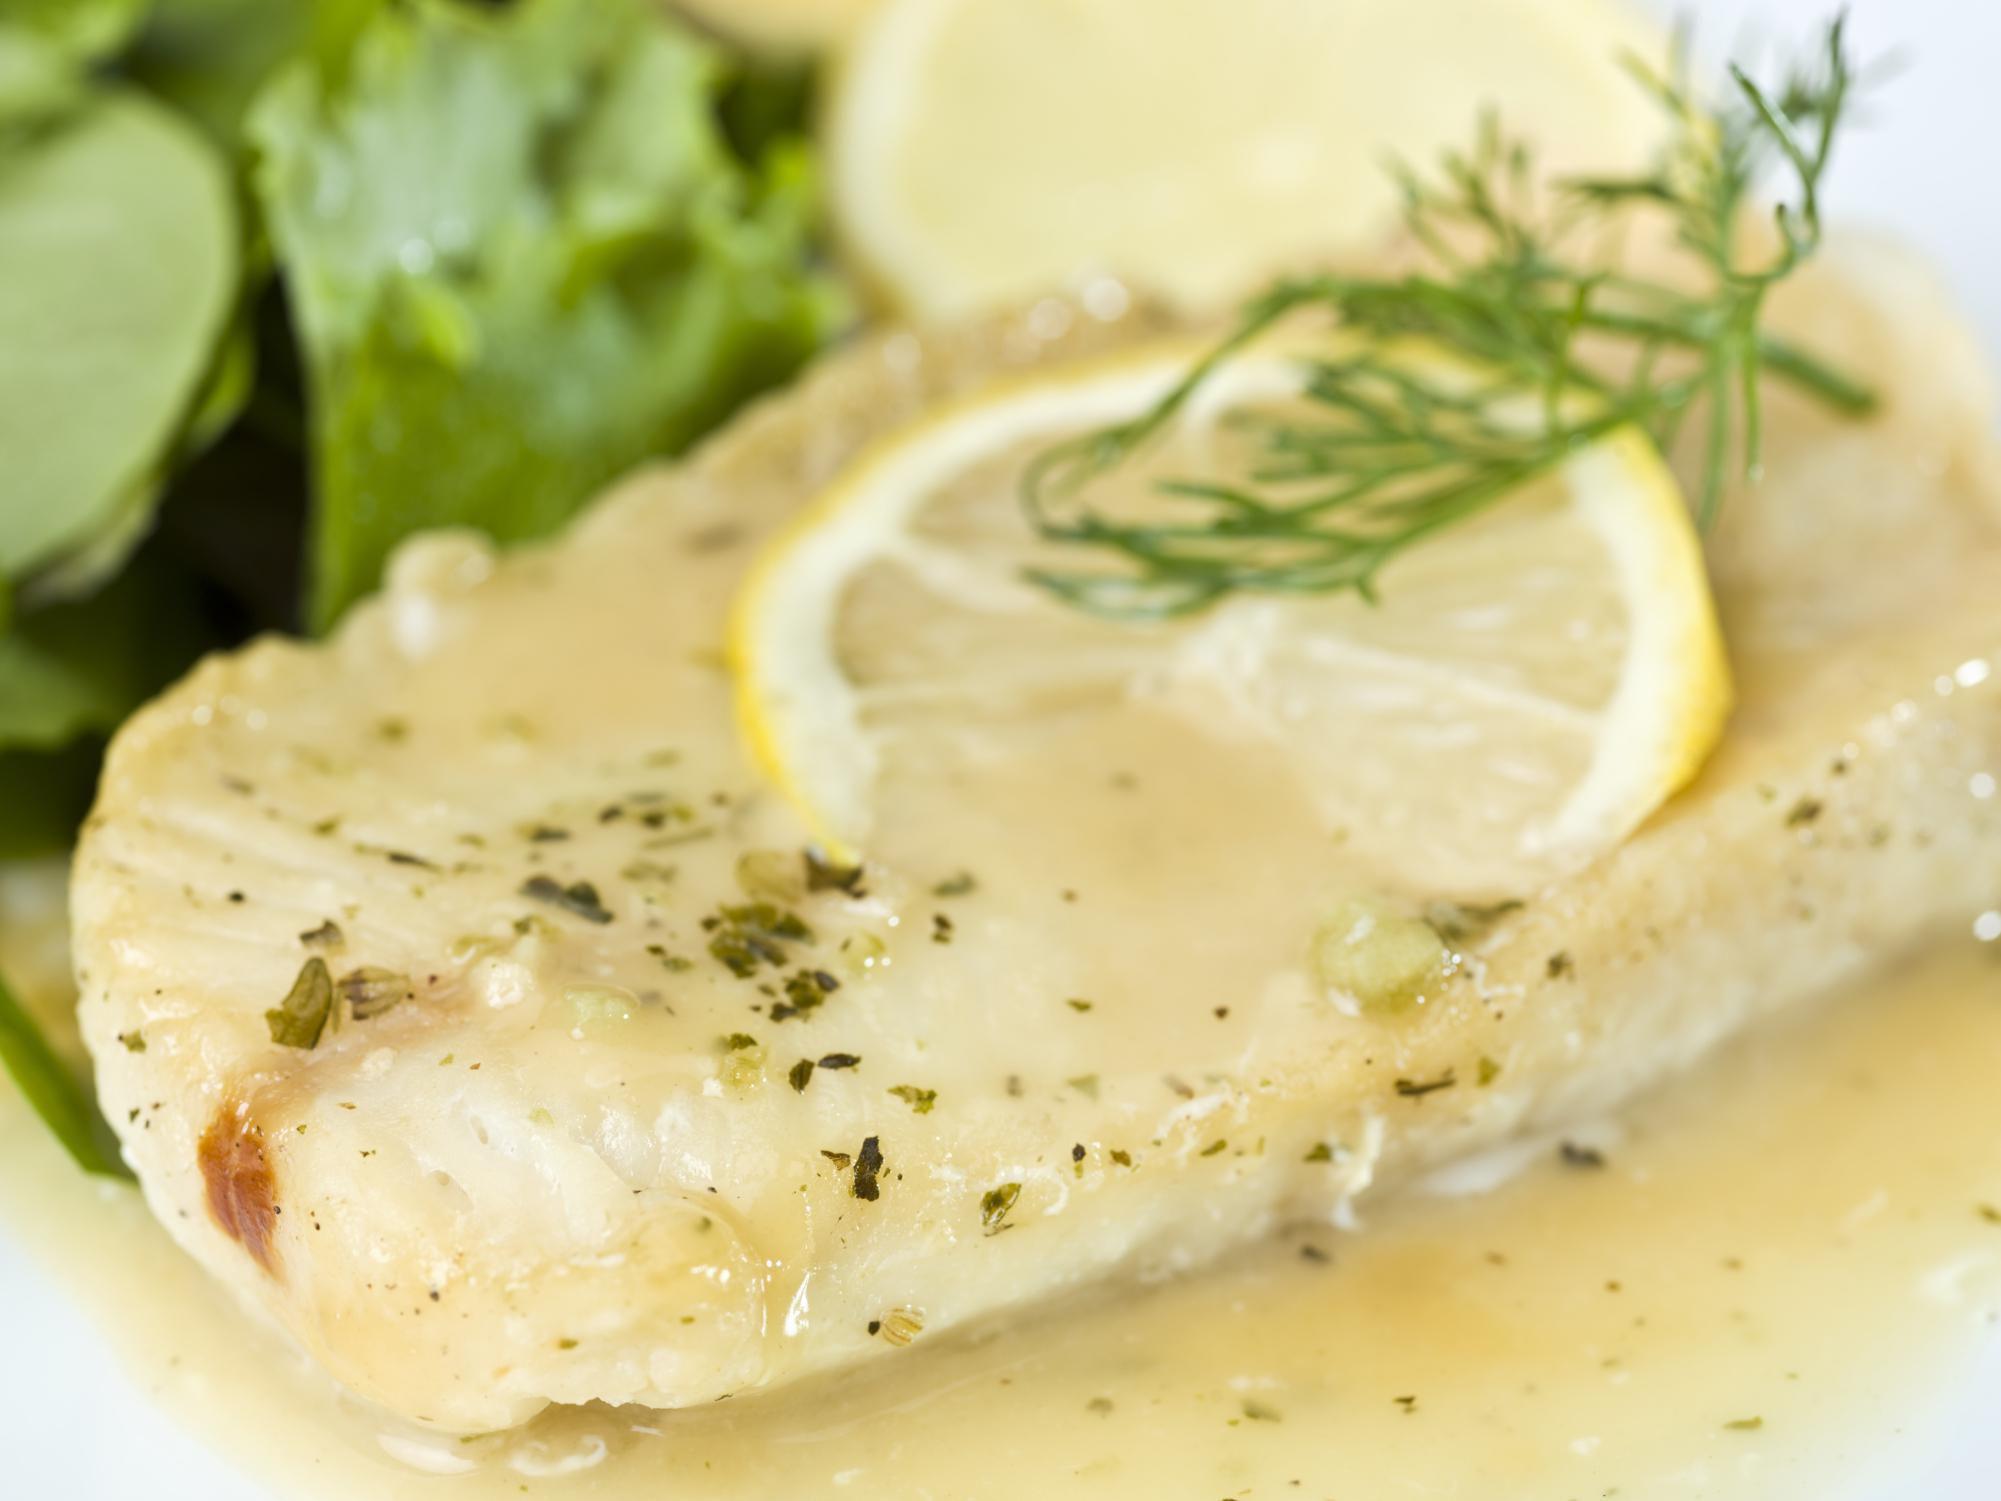 lemon beurre blanc sauce recipe french food - Bur Blanc Recipe